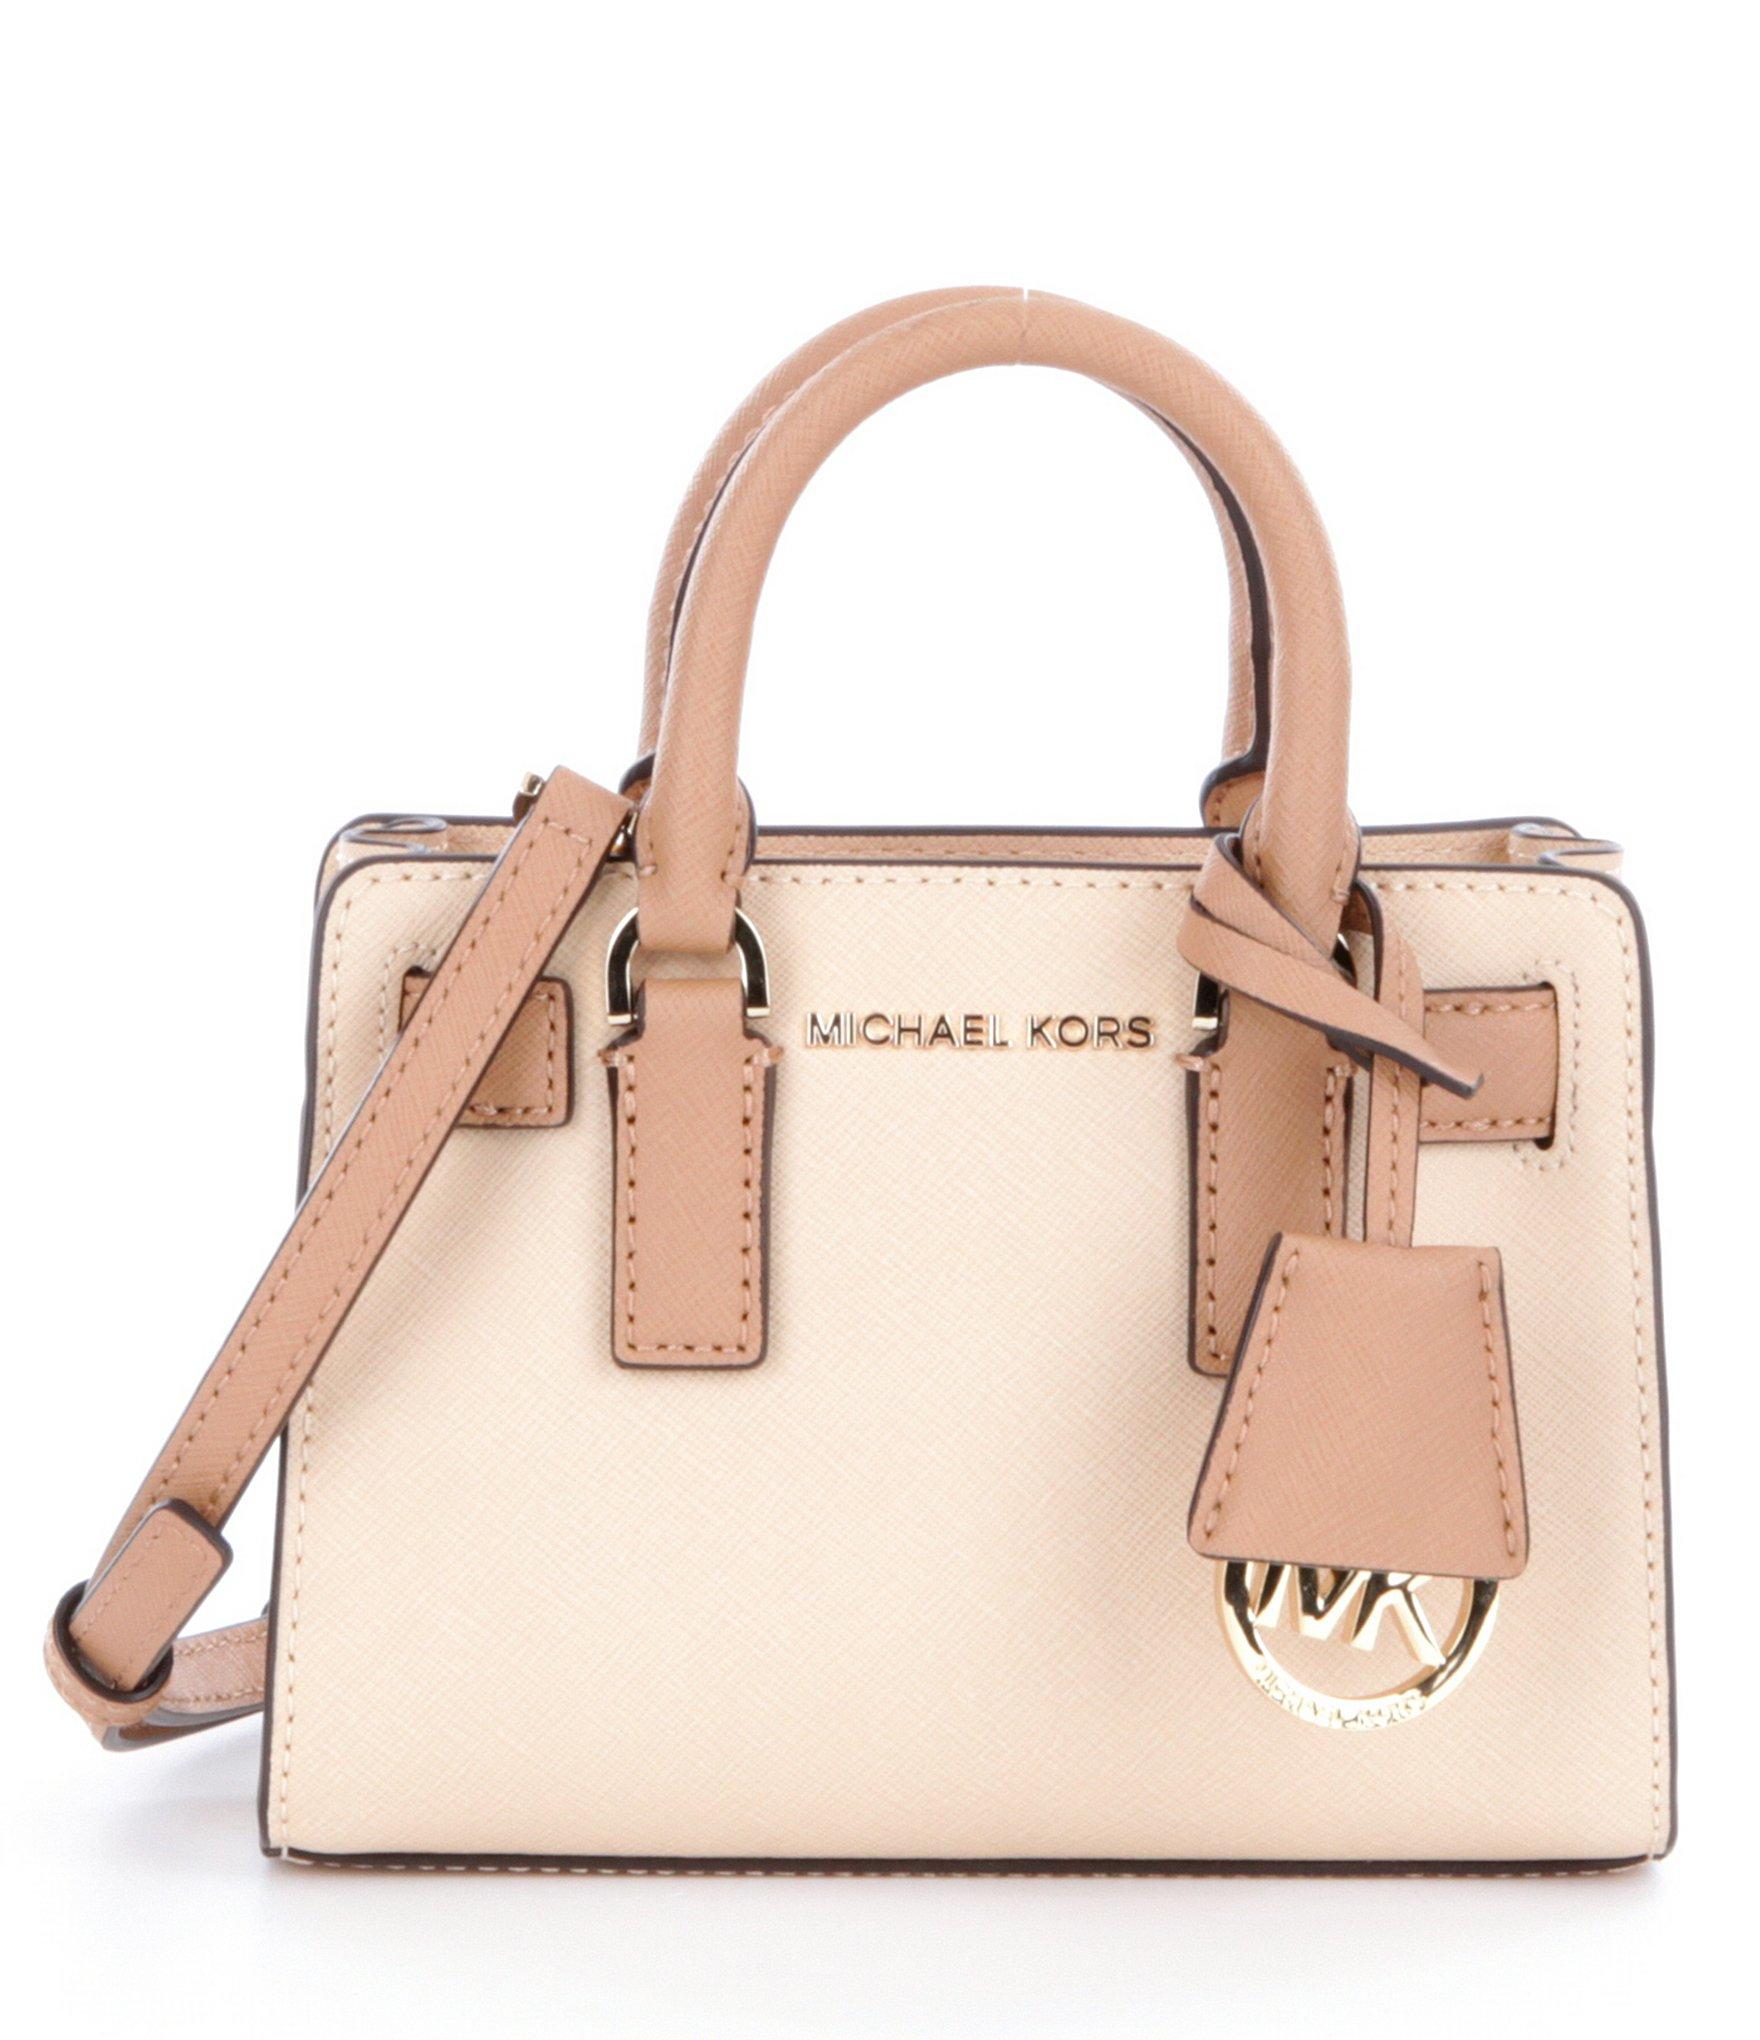 95a65ebb93a3 MICHAEL Michael Kors Dillon Xs Cross-body Bag in Natural - Lyst